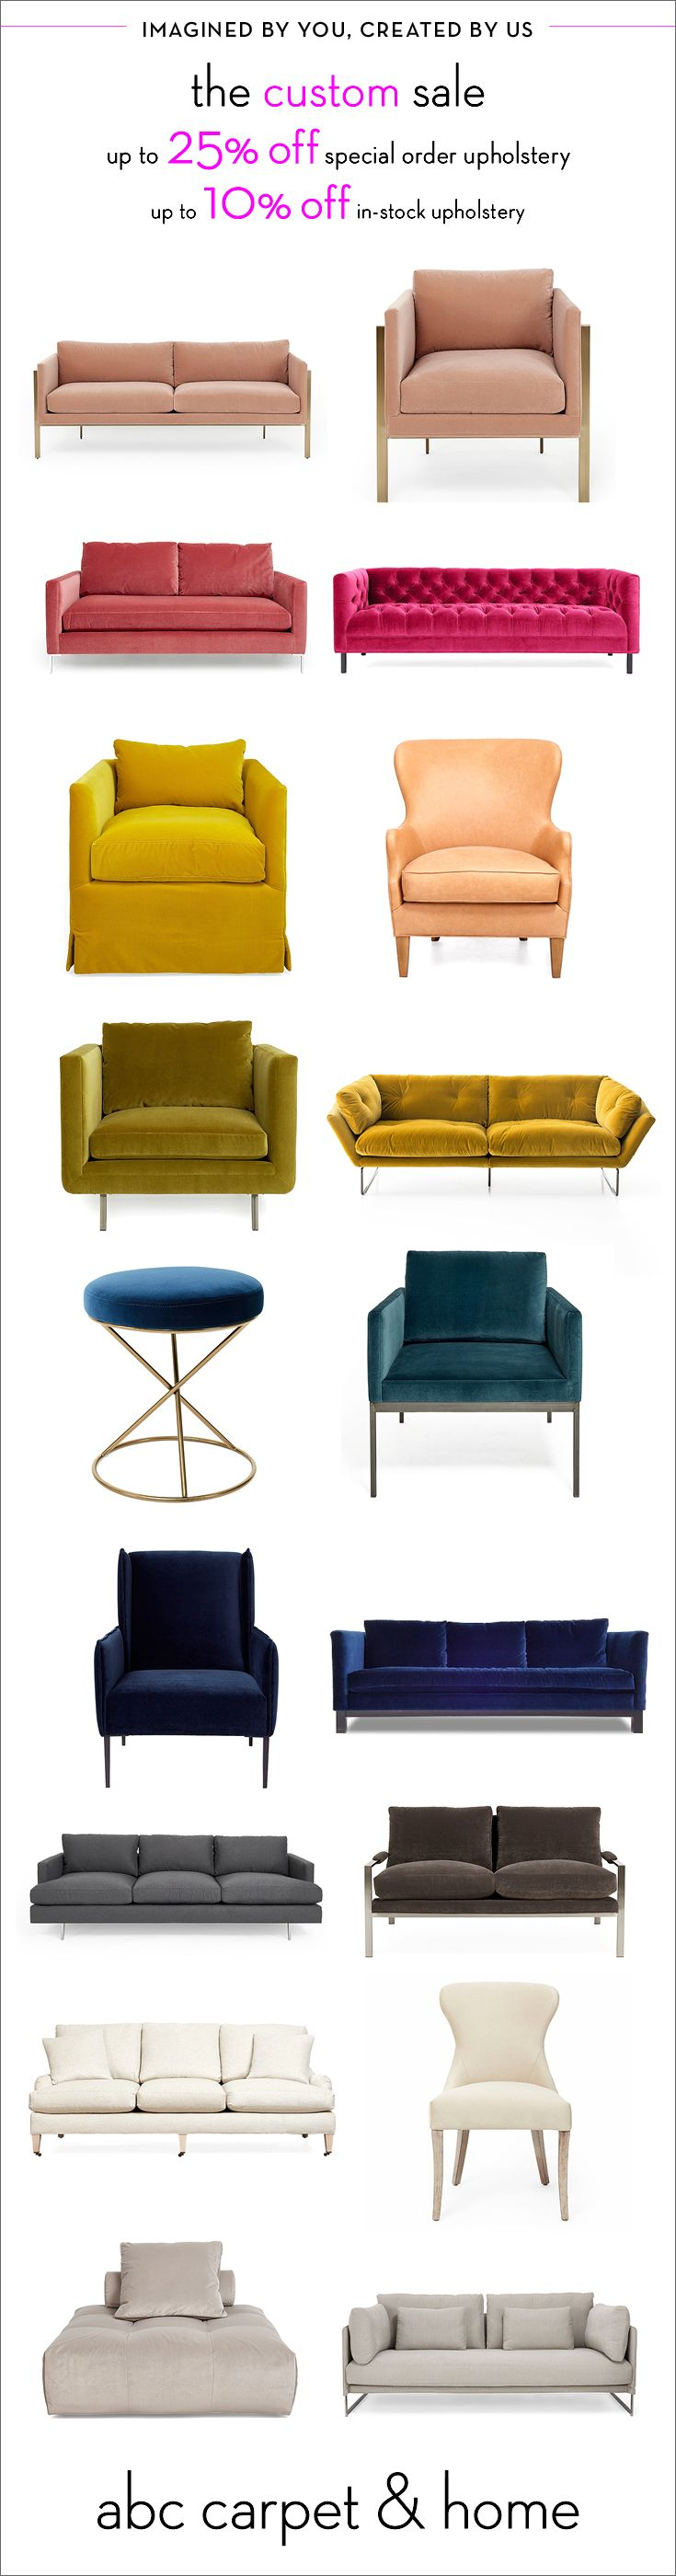 103 best Furniture images on Pinterest